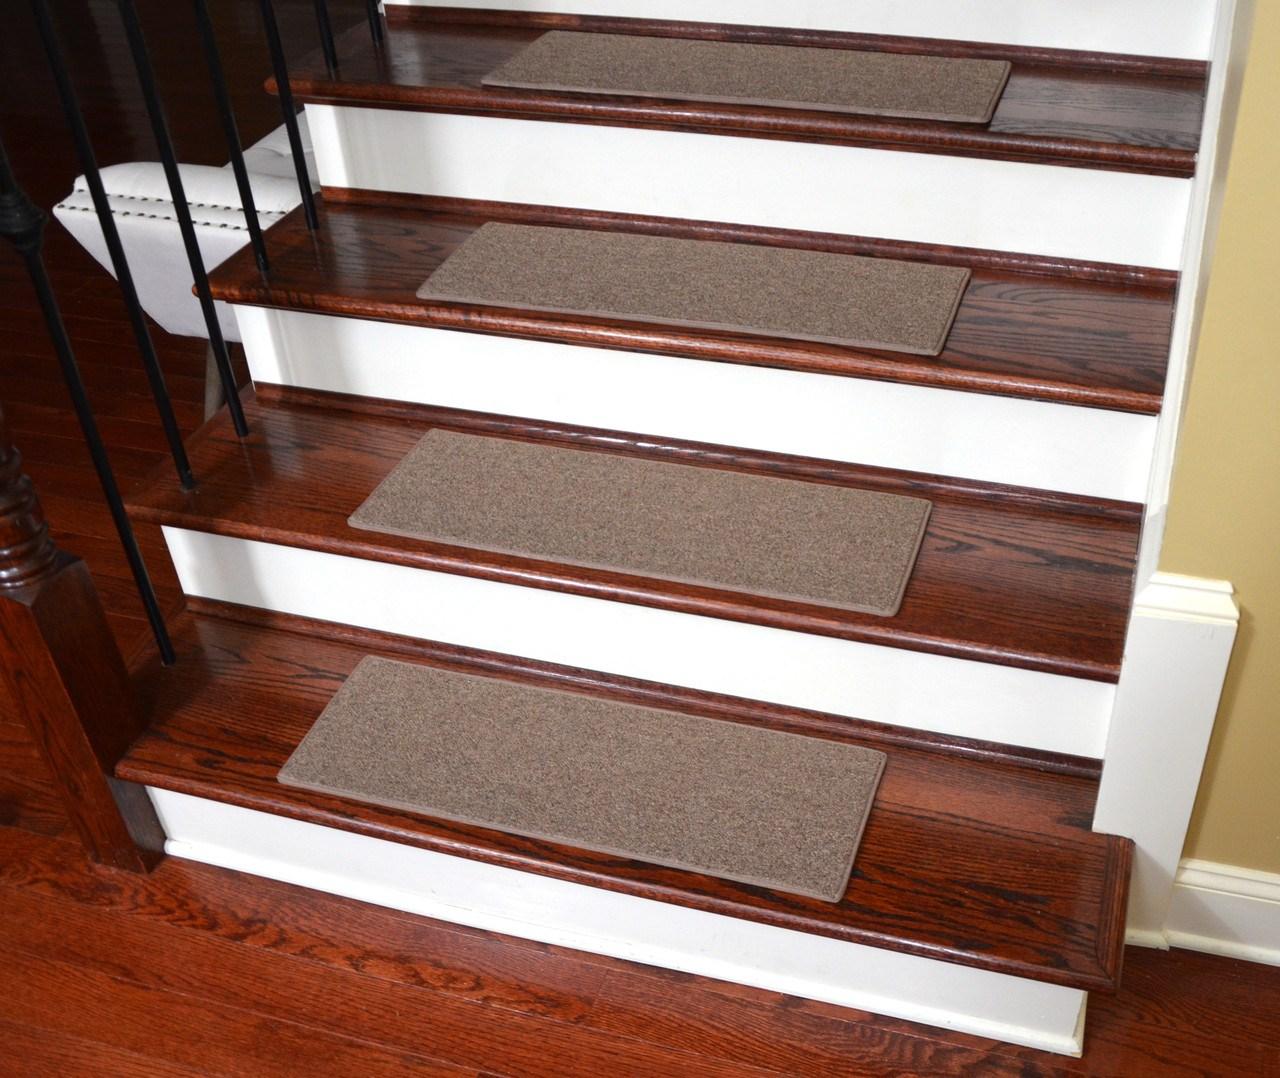 Non Slip Tape Free Carpet Stair Treads For Dogs Set Of 15 | Rug Stair Treads Non Slip | Bullnose Carpet | Gloria Rug | Slip Resistant | Tread Covers | Flooring